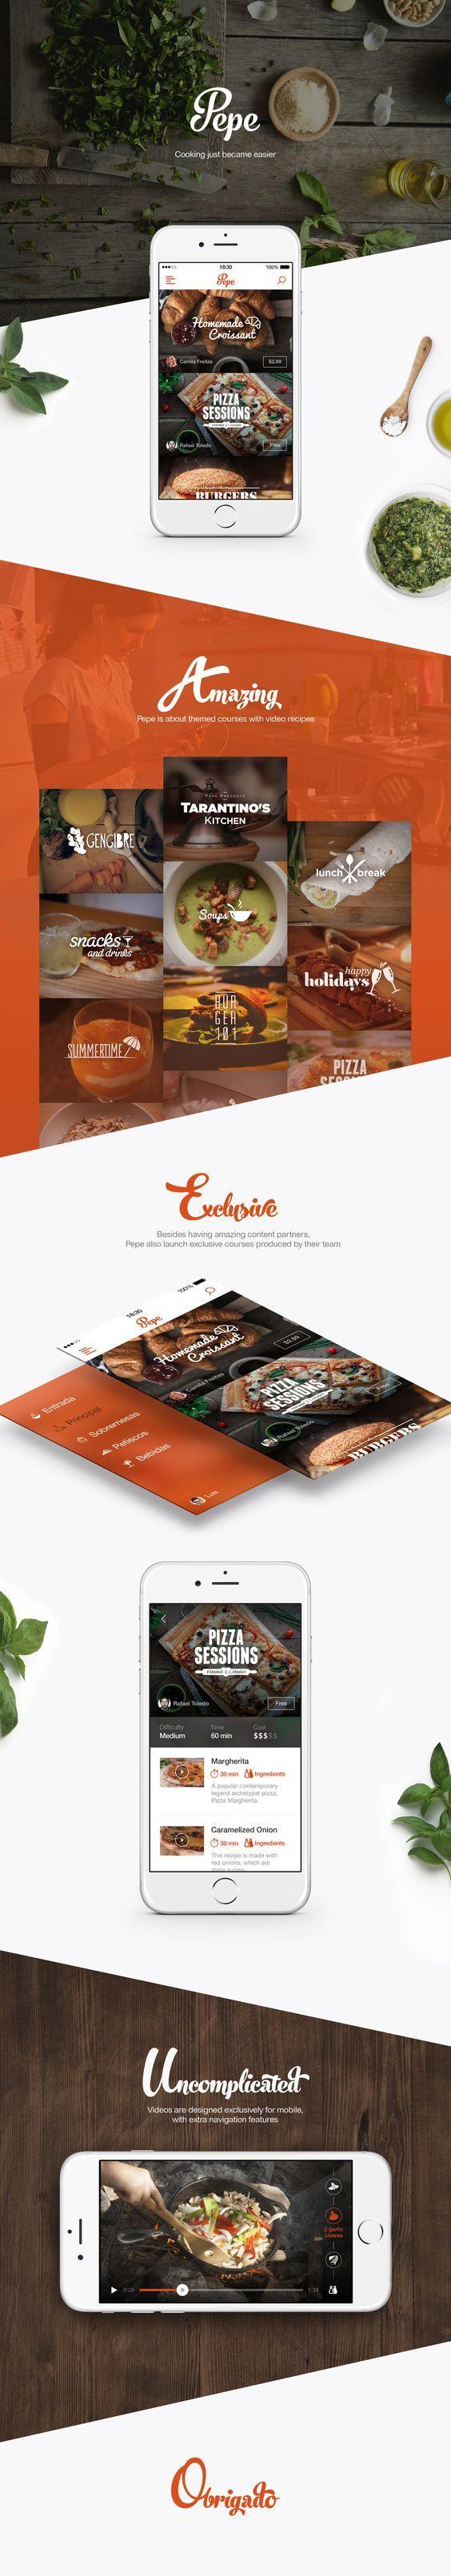 Pepe Web Design | Fivestar Branding – Design and Branding Agency & Inspiration Gallery